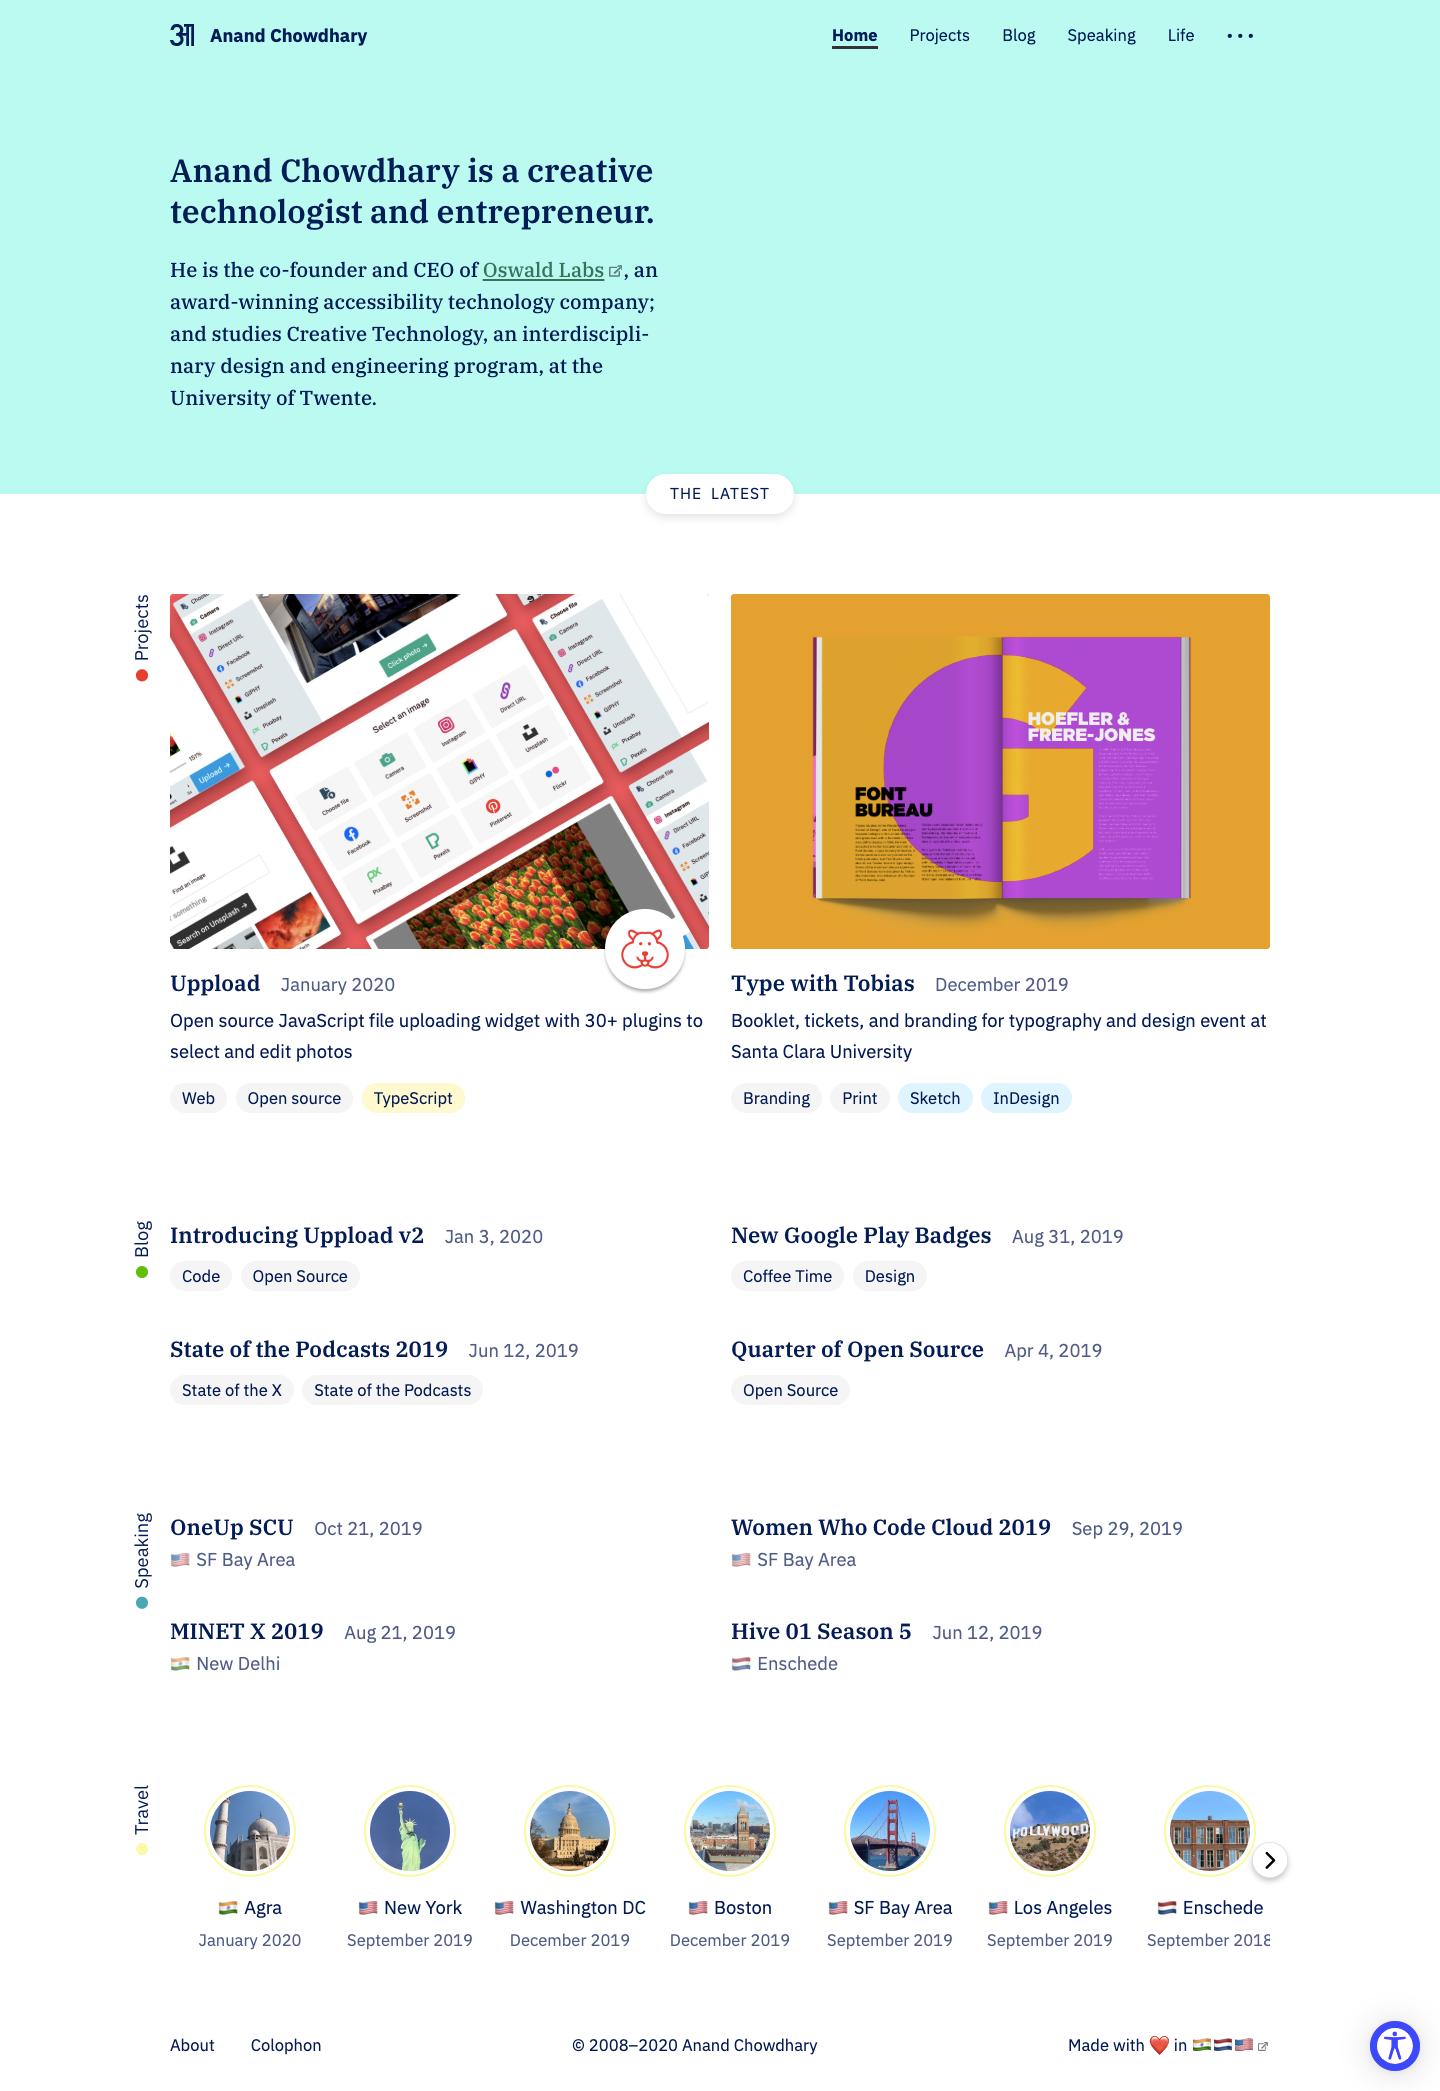 Screenshot of Amsterdam homepage